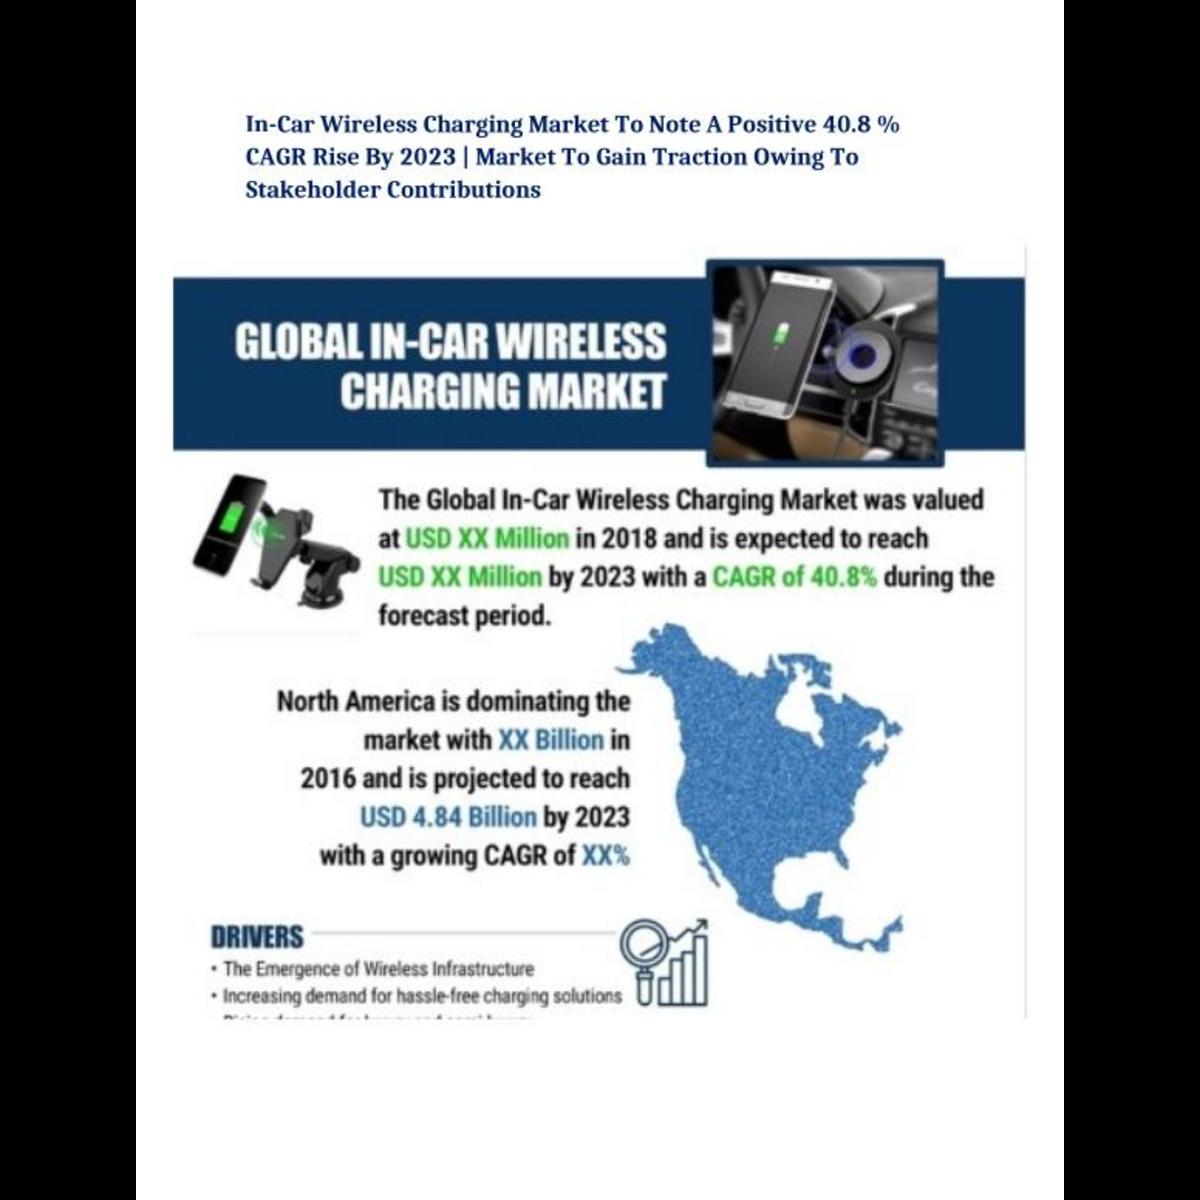 In-Car Wireless Charging Market